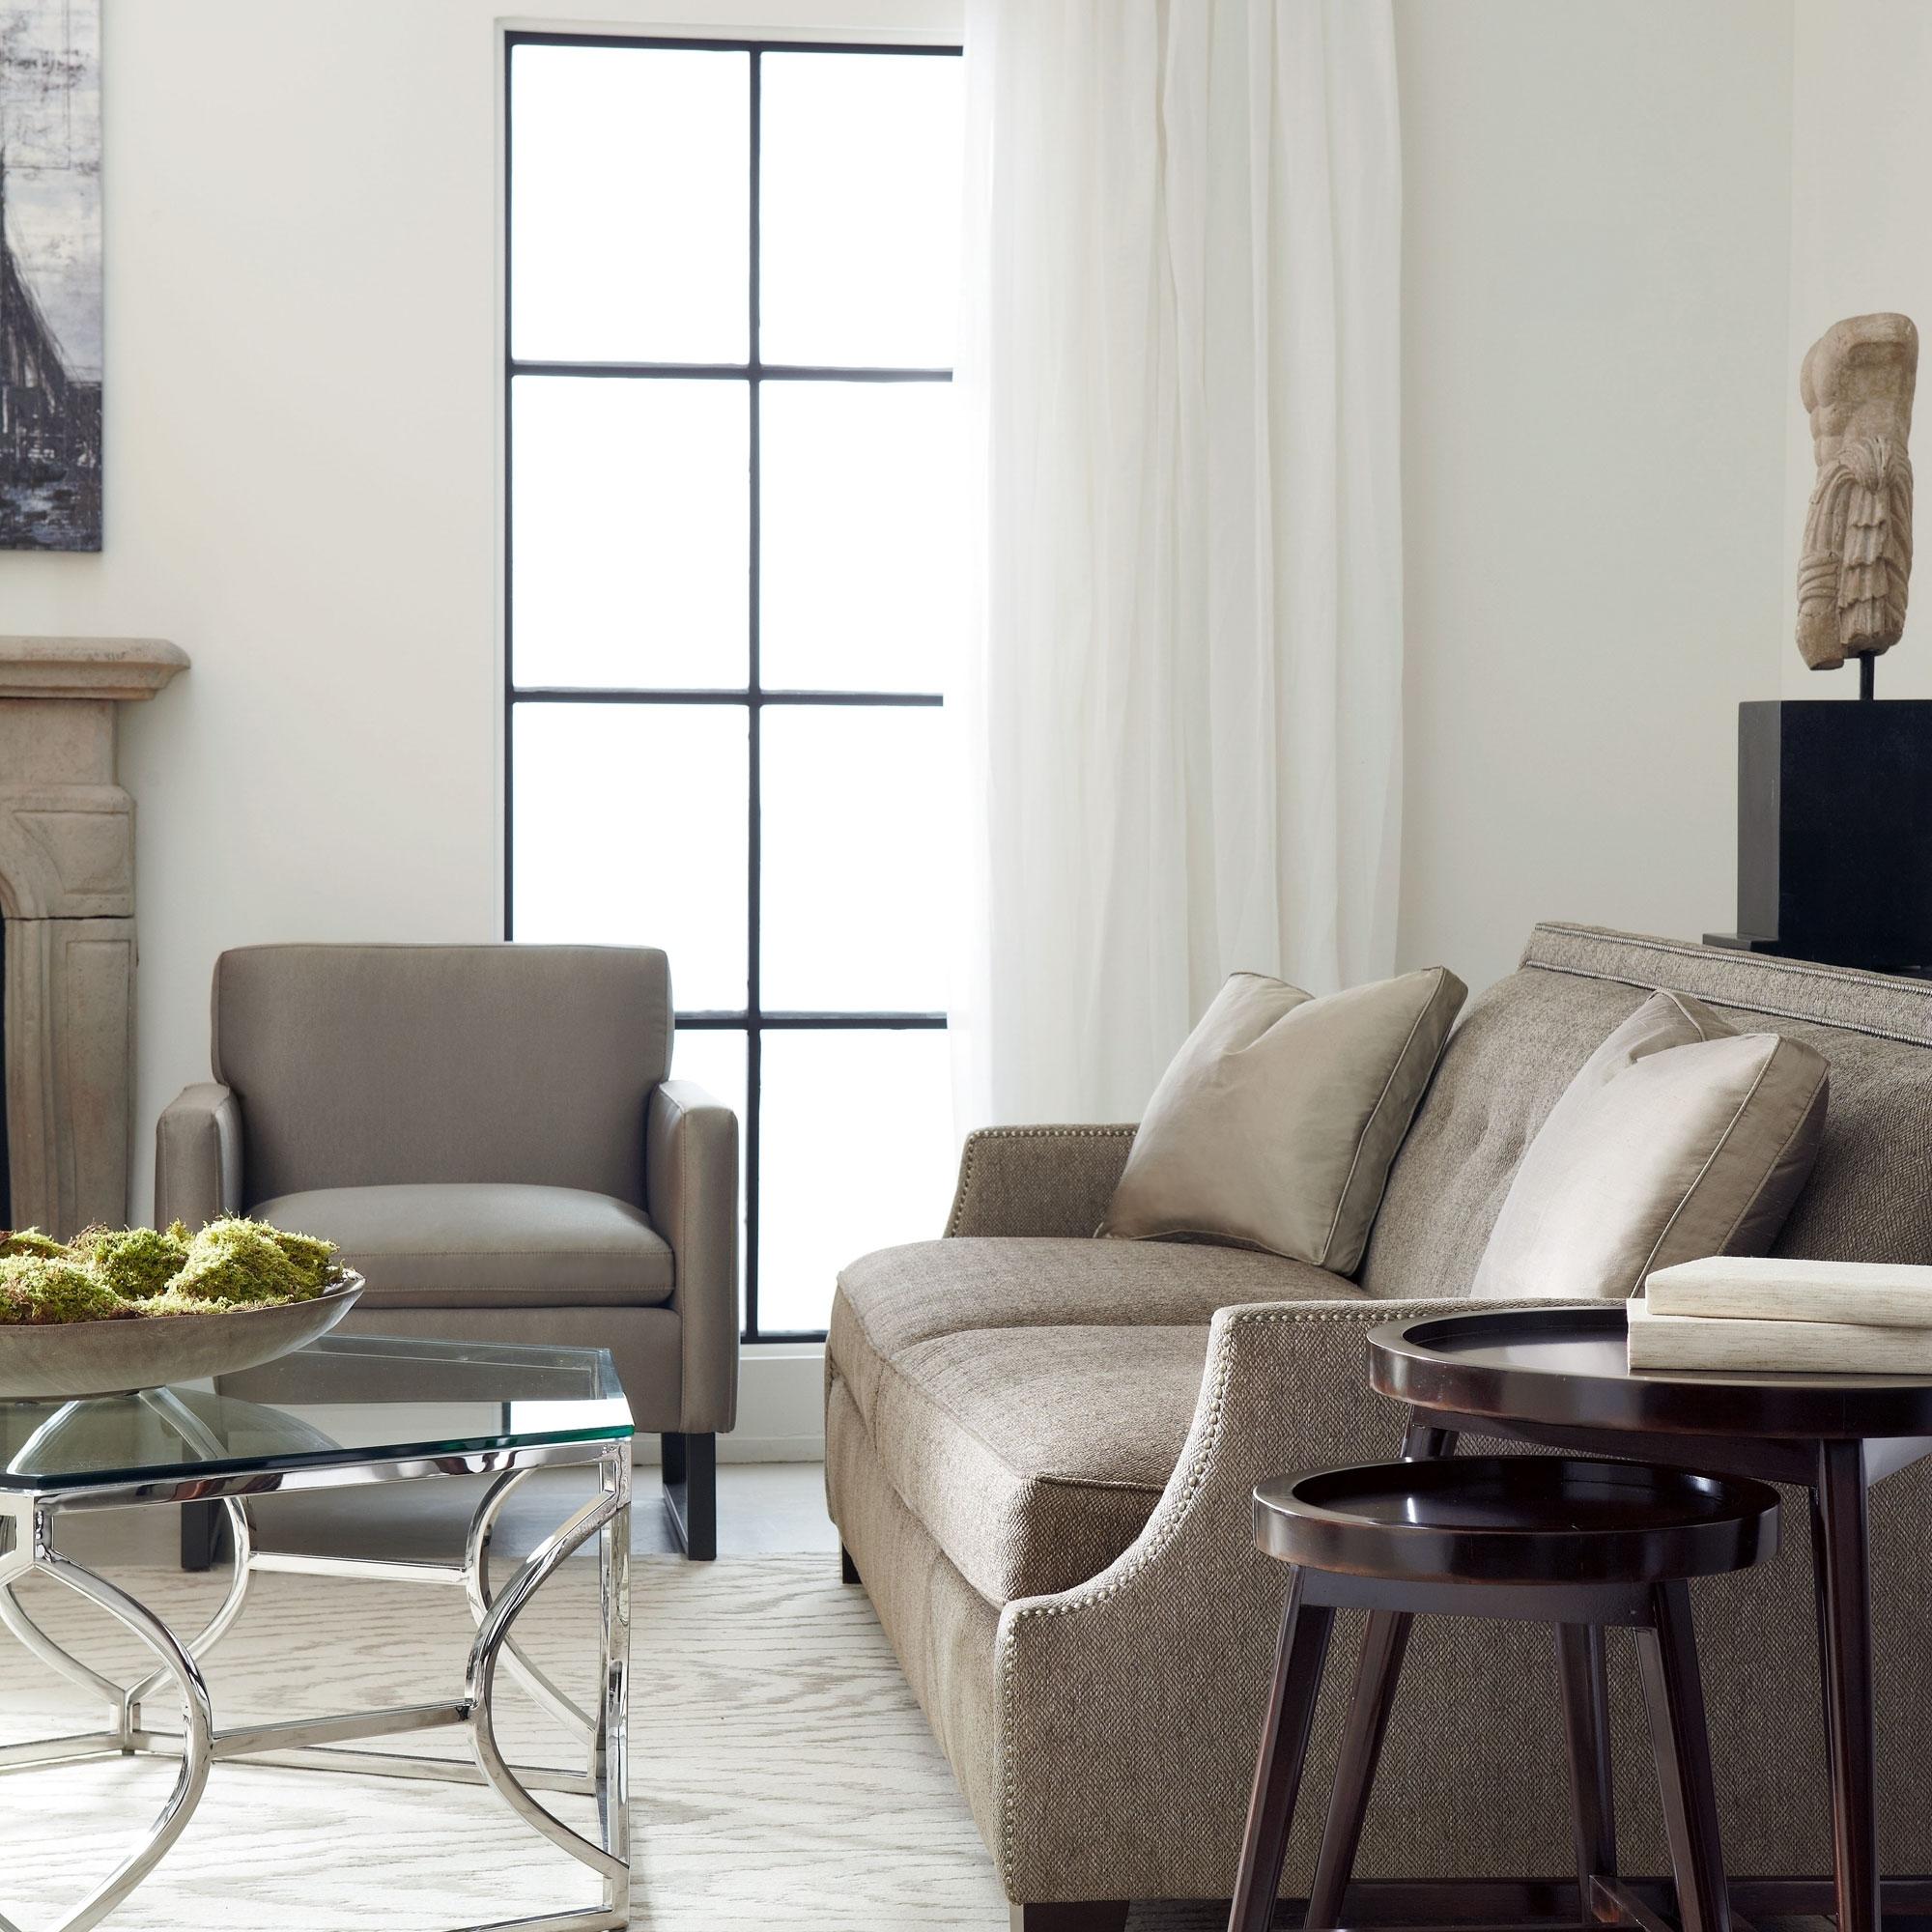 Argent Franco Jaxon Living Room (View 2 of 20)